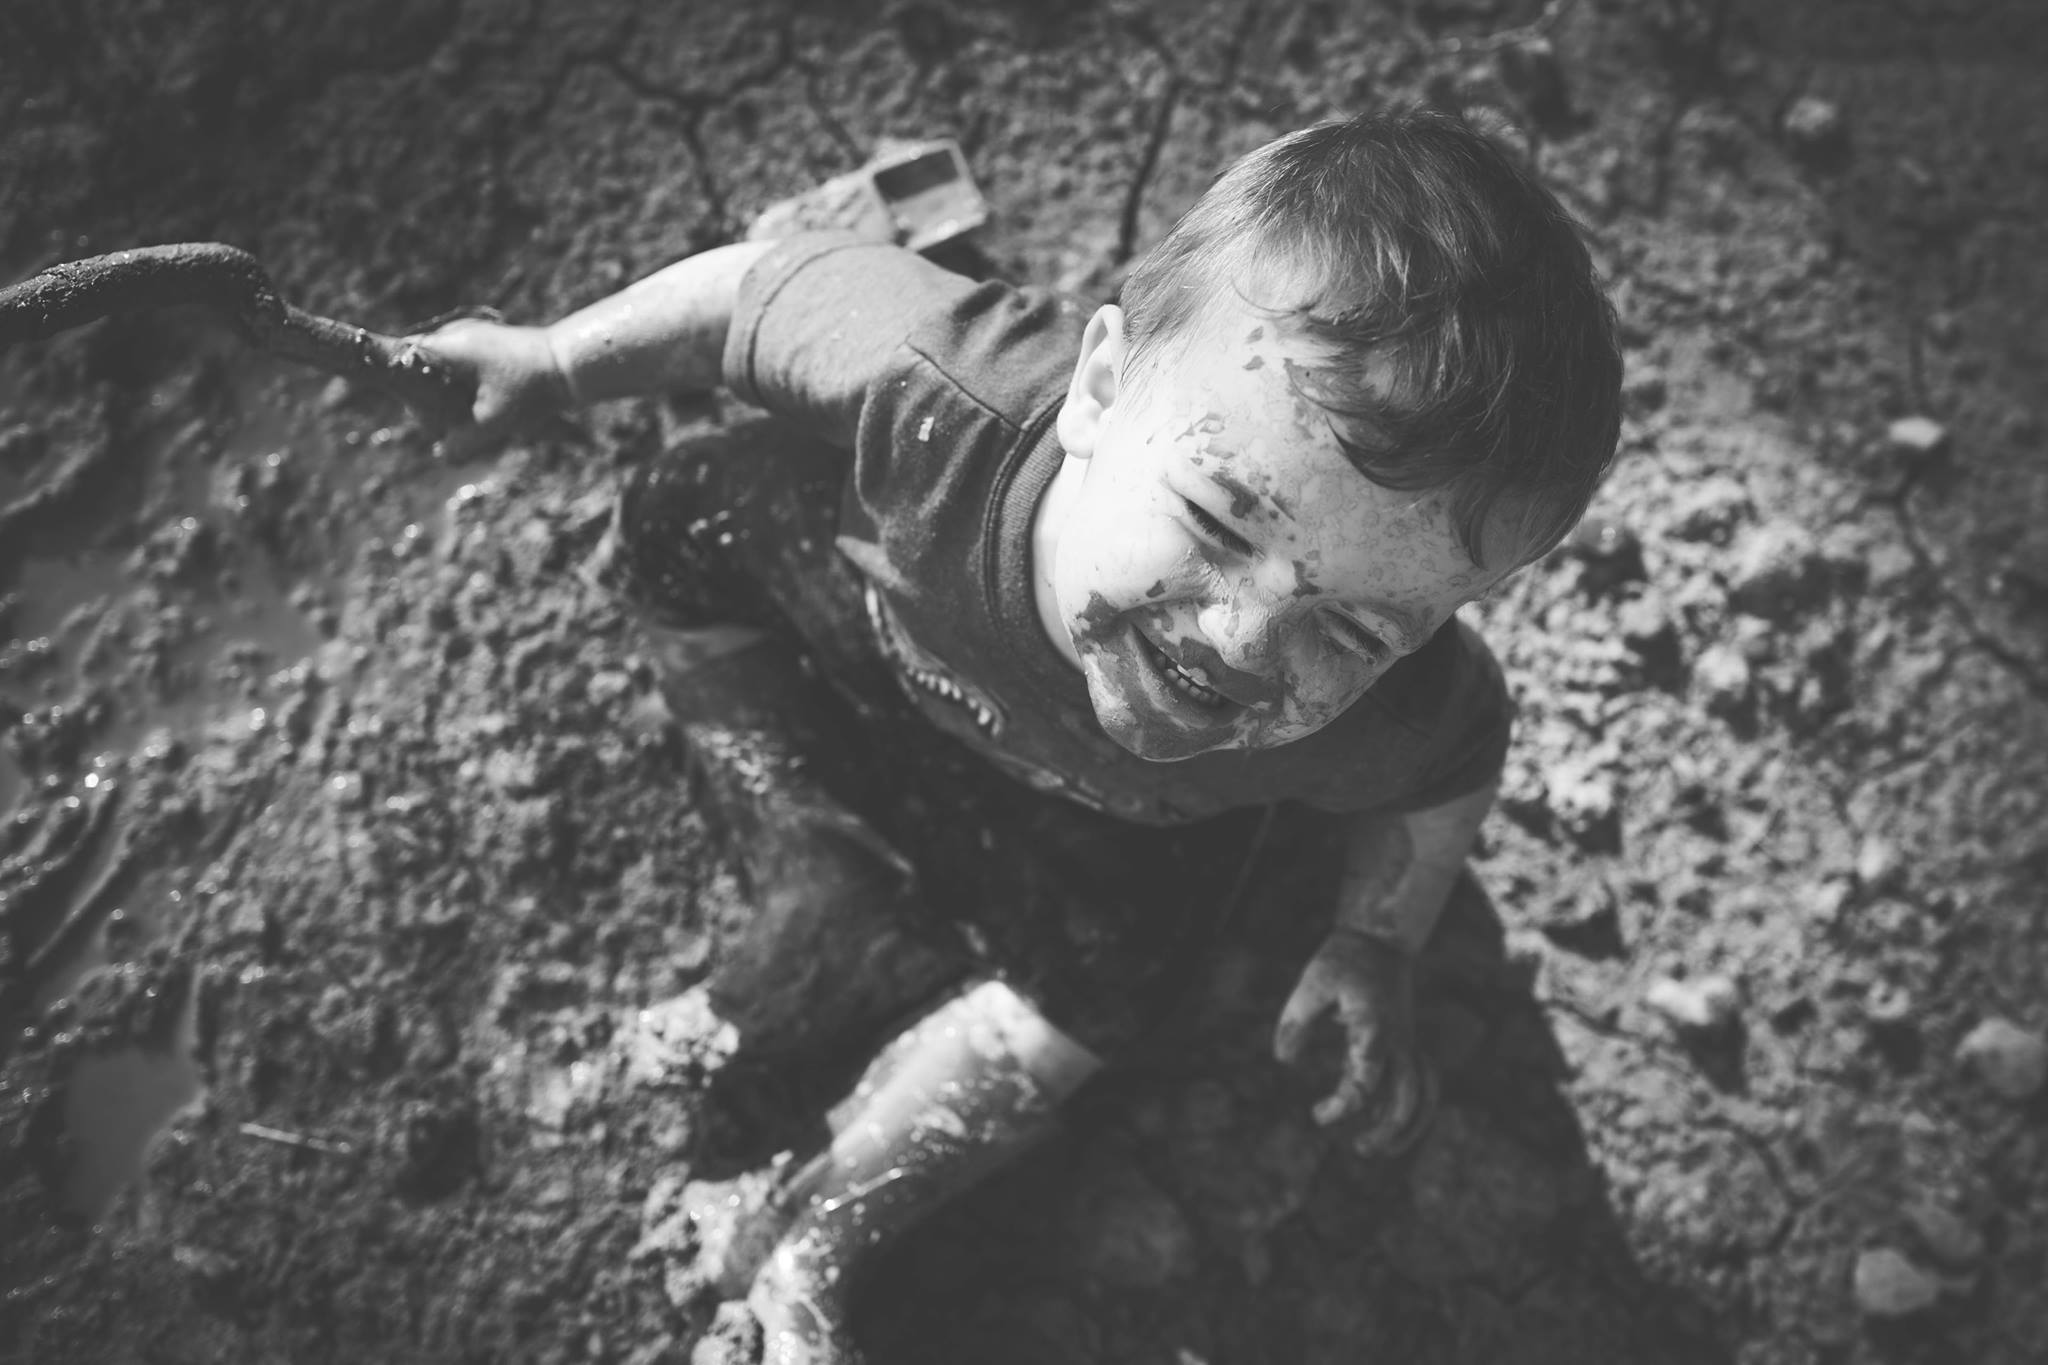 PENNSYLVANIA - ASHLEIGH WILLIAMSON  WWW.INSTAGRAM.COM/ASHLEIGHWILLIAMSONPHOTOGRAPHY